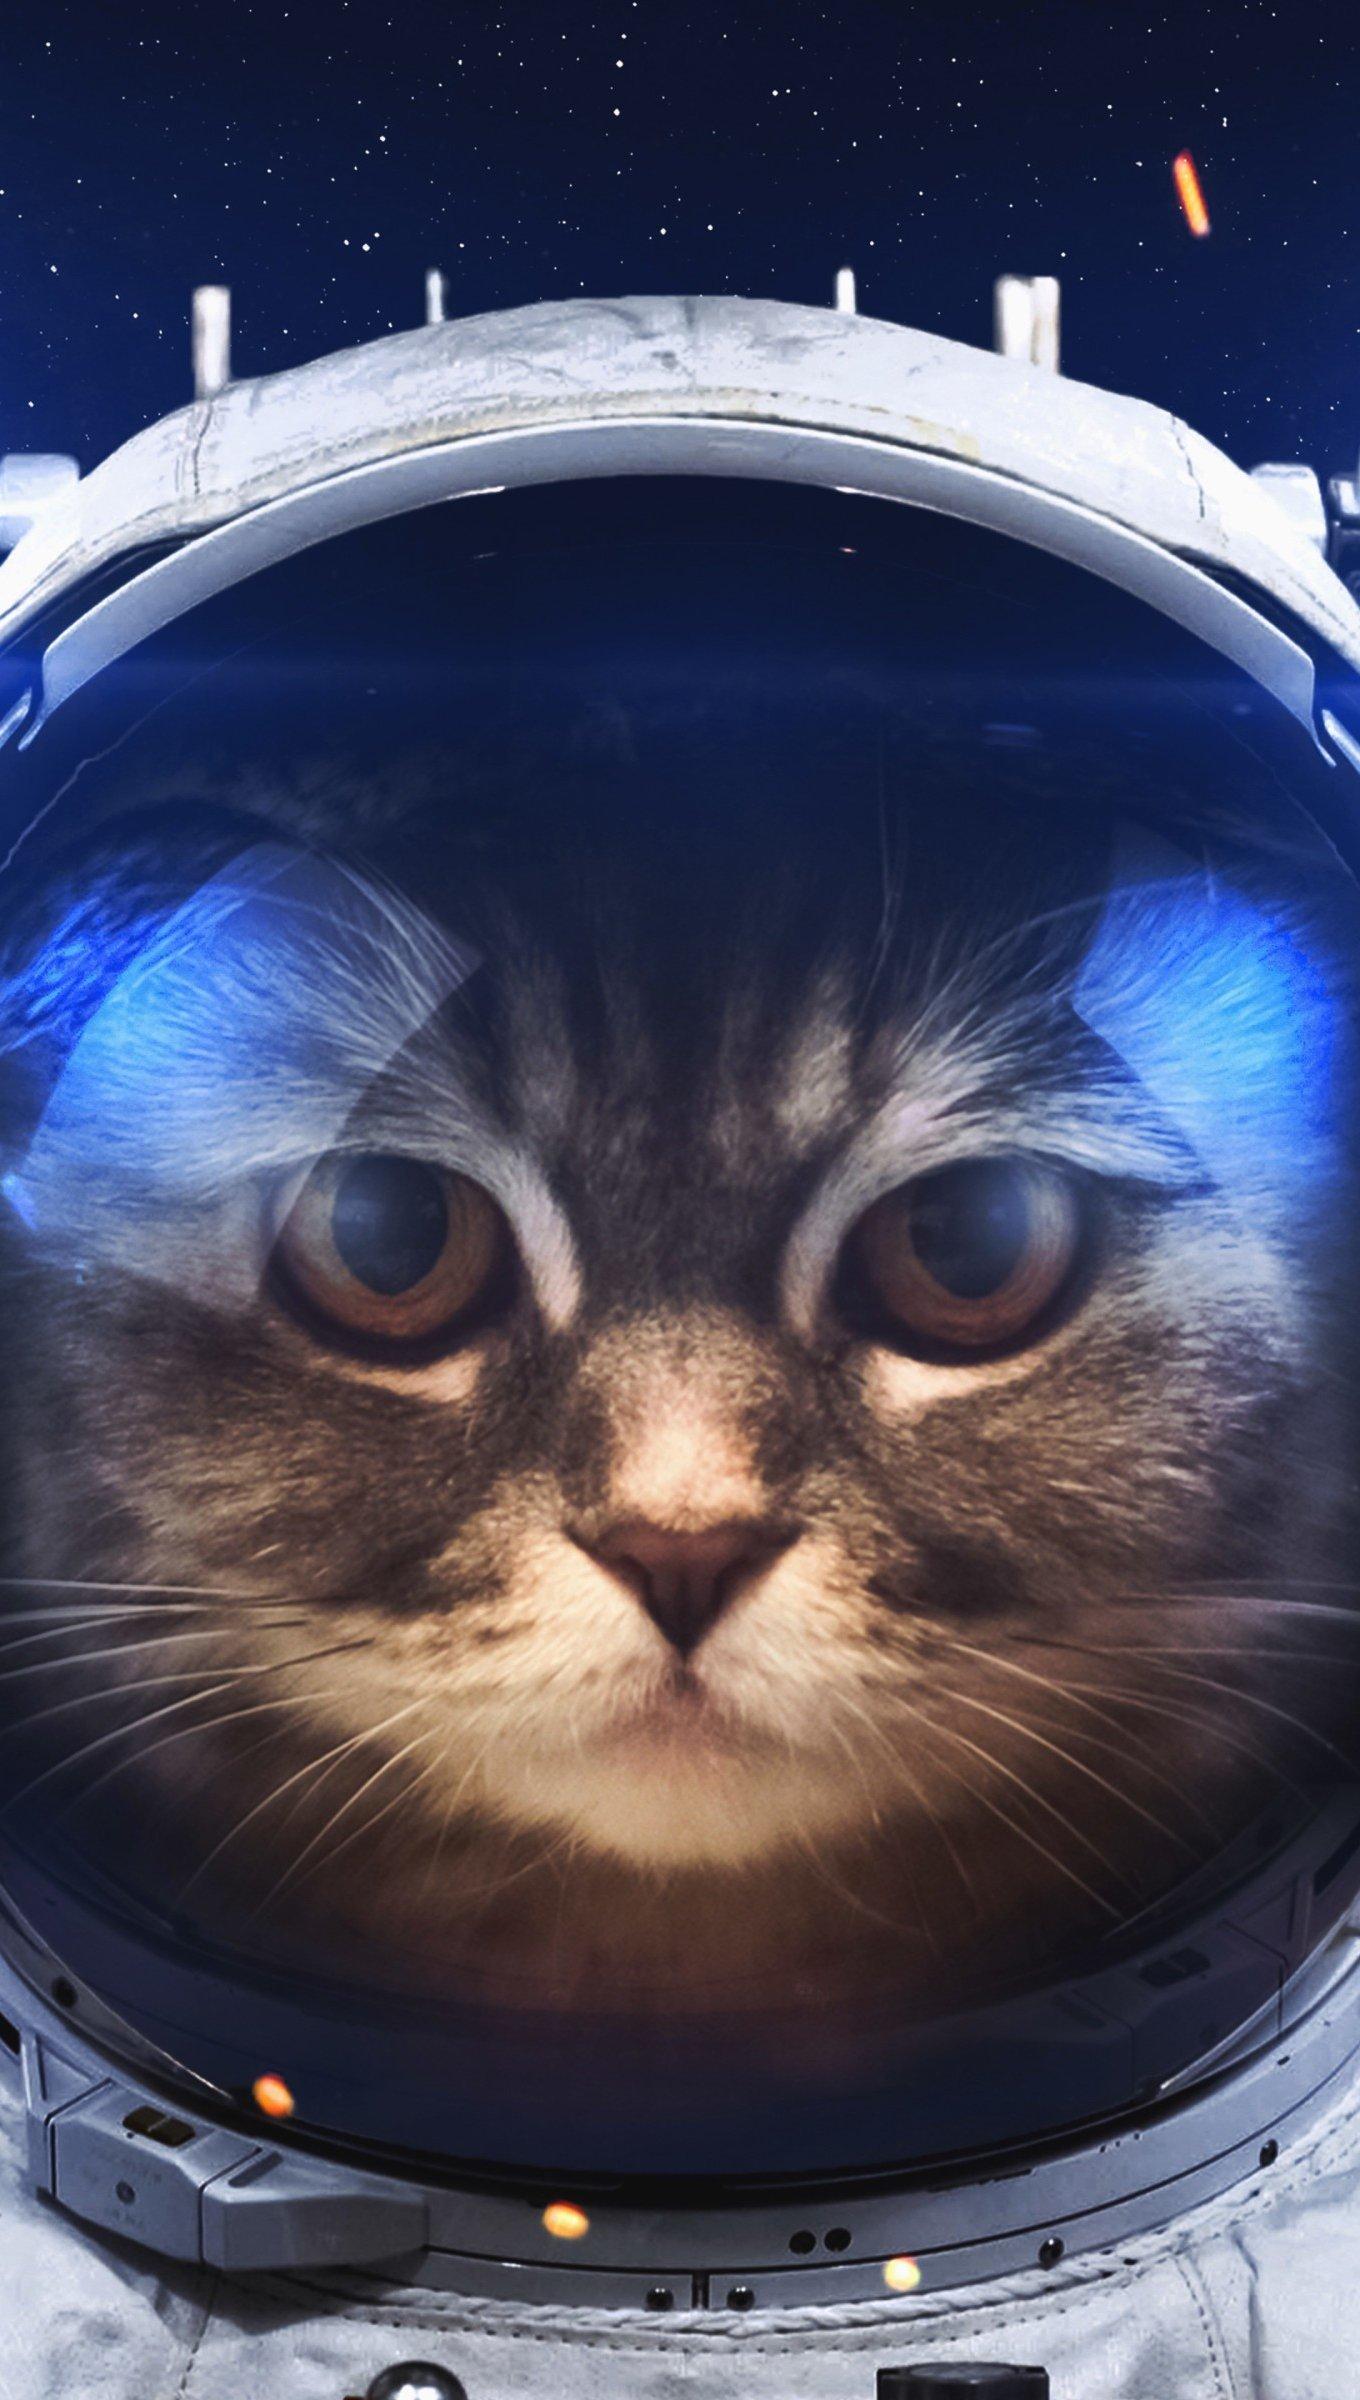 Wallpaper Astronaut Cat Vertical